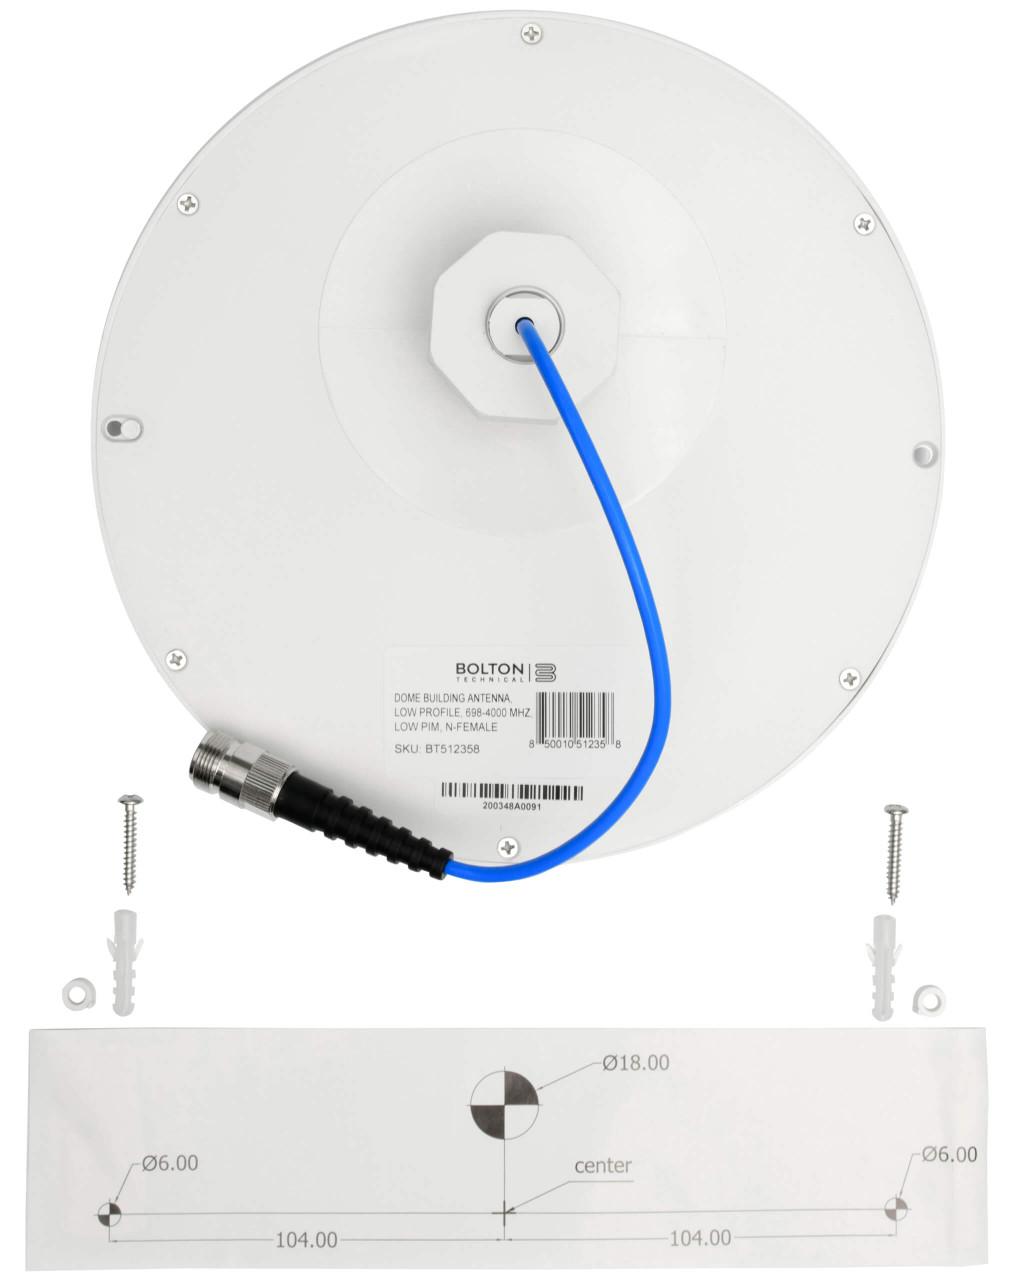 The Cowboy 75 - Inside Dome Antenna